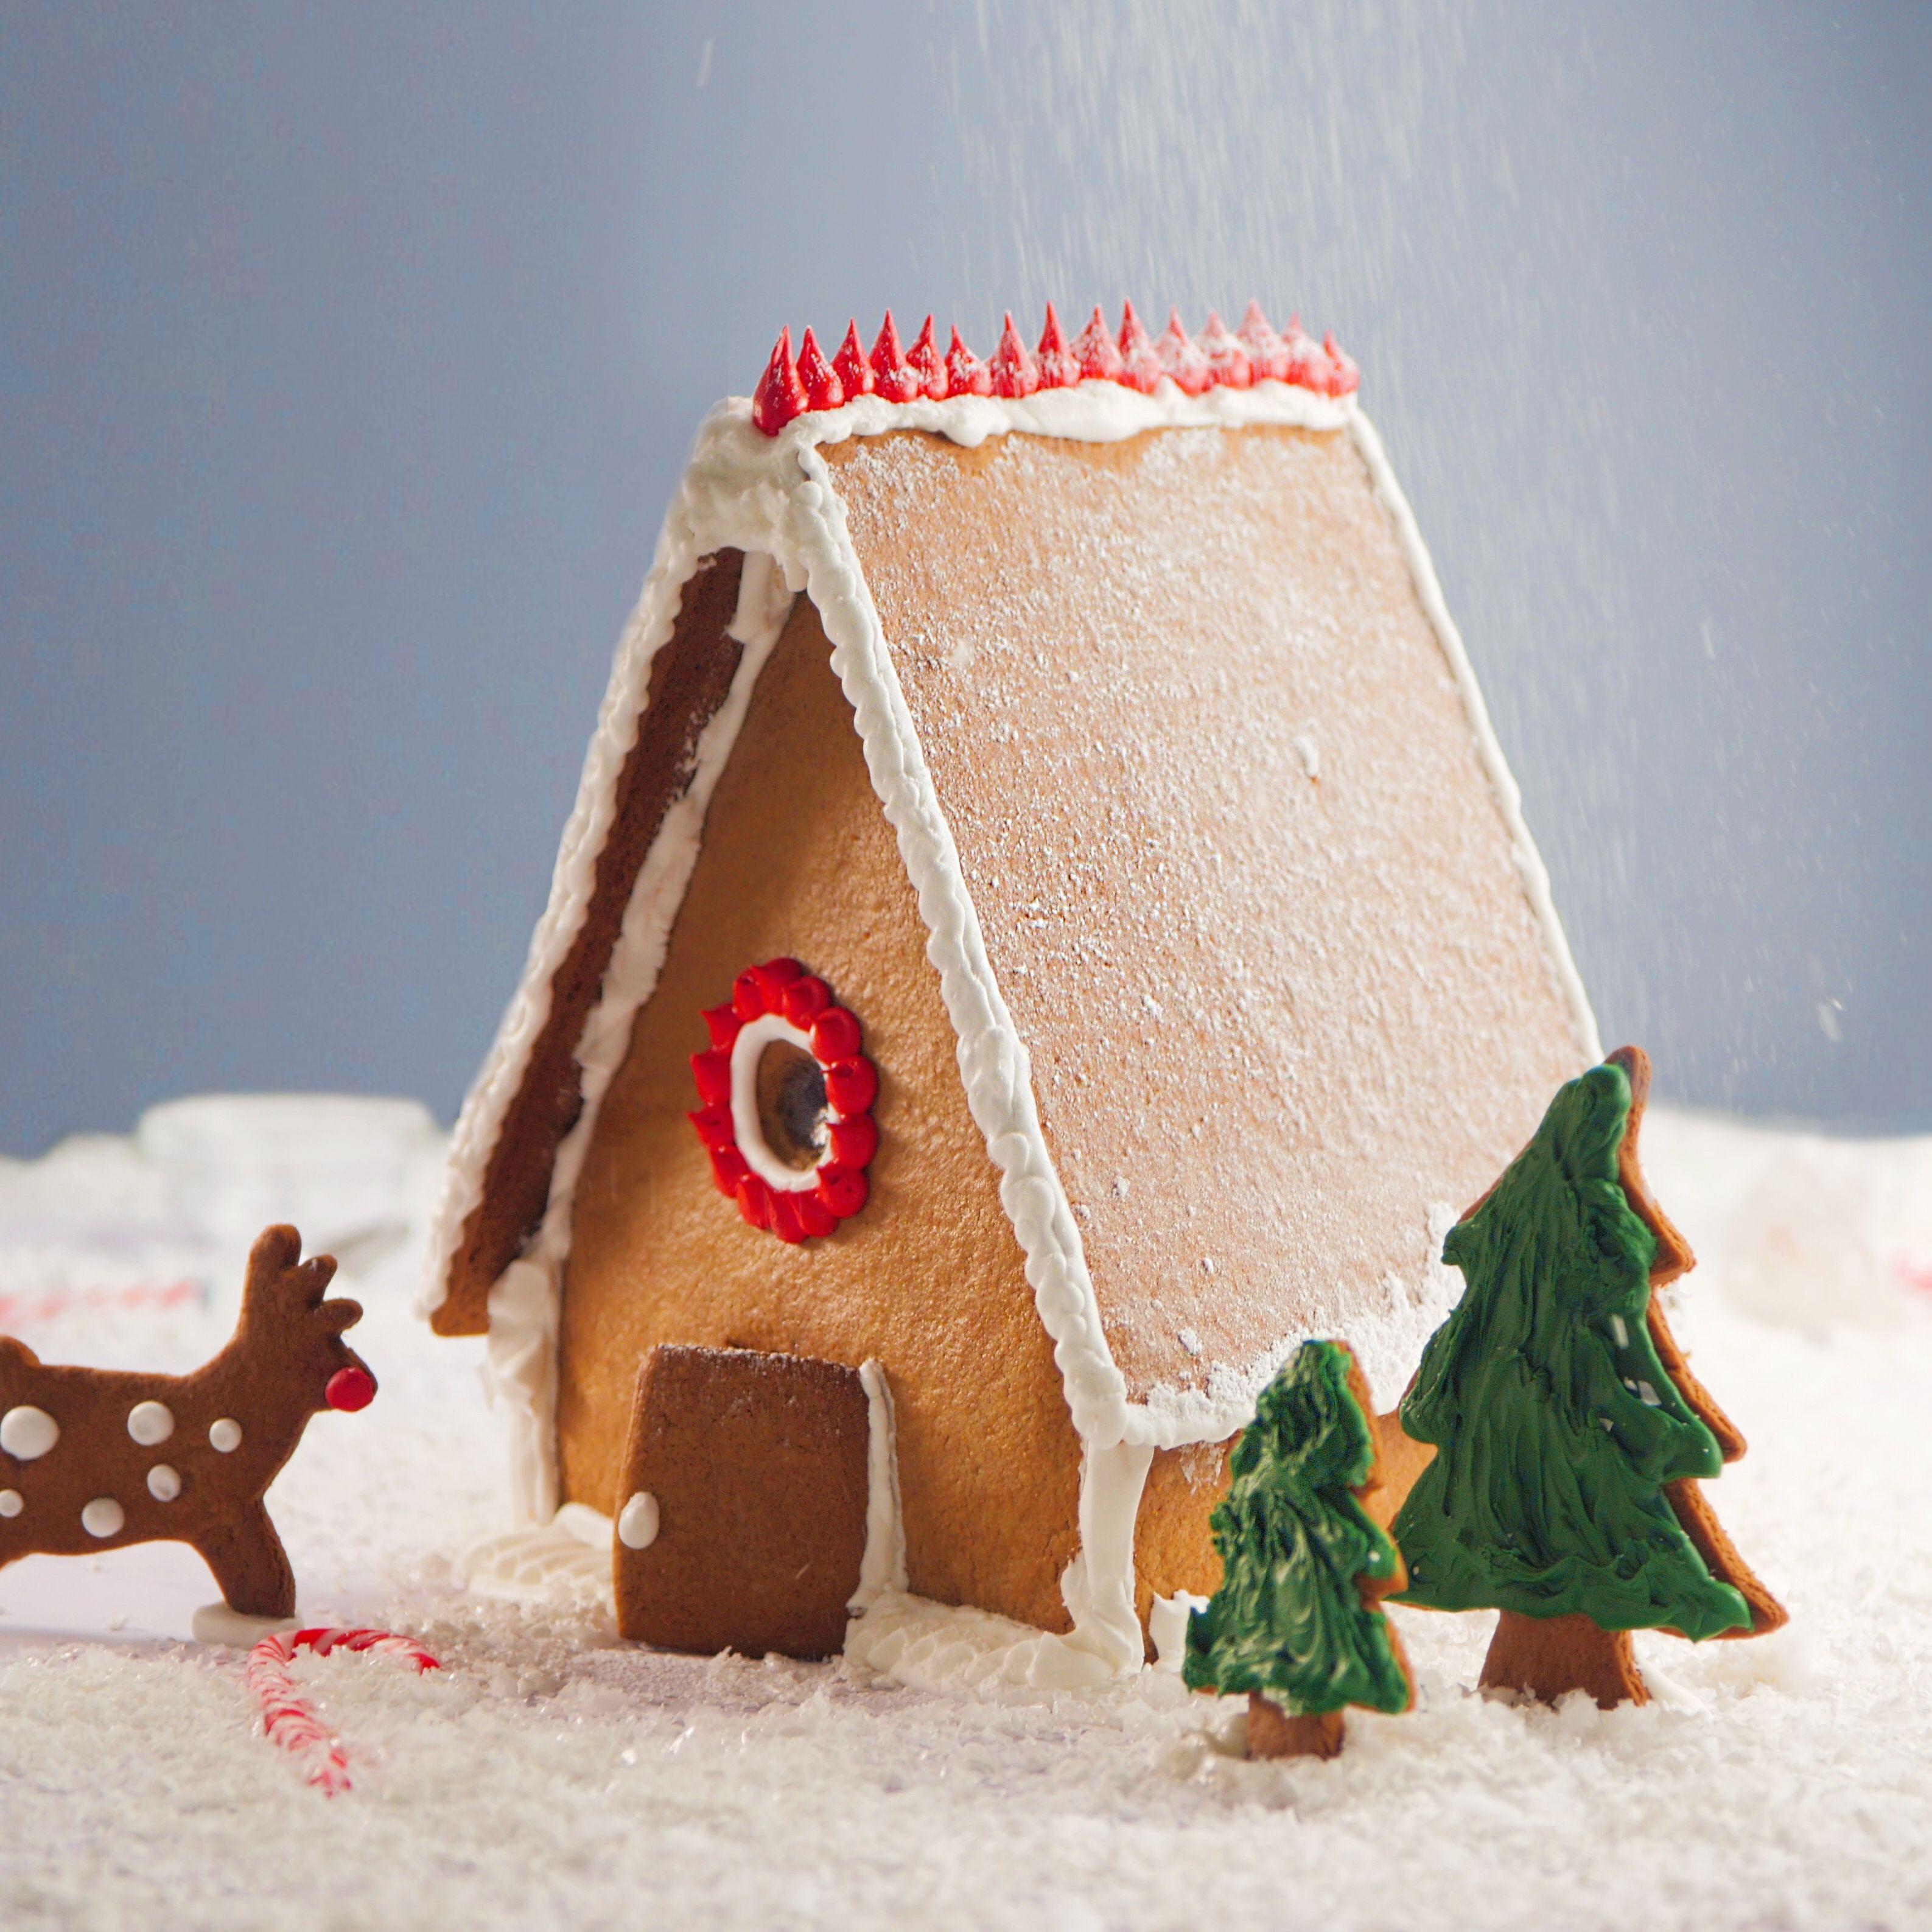 Gingerbread House Recipe Winter Wonderland Gingerbread House